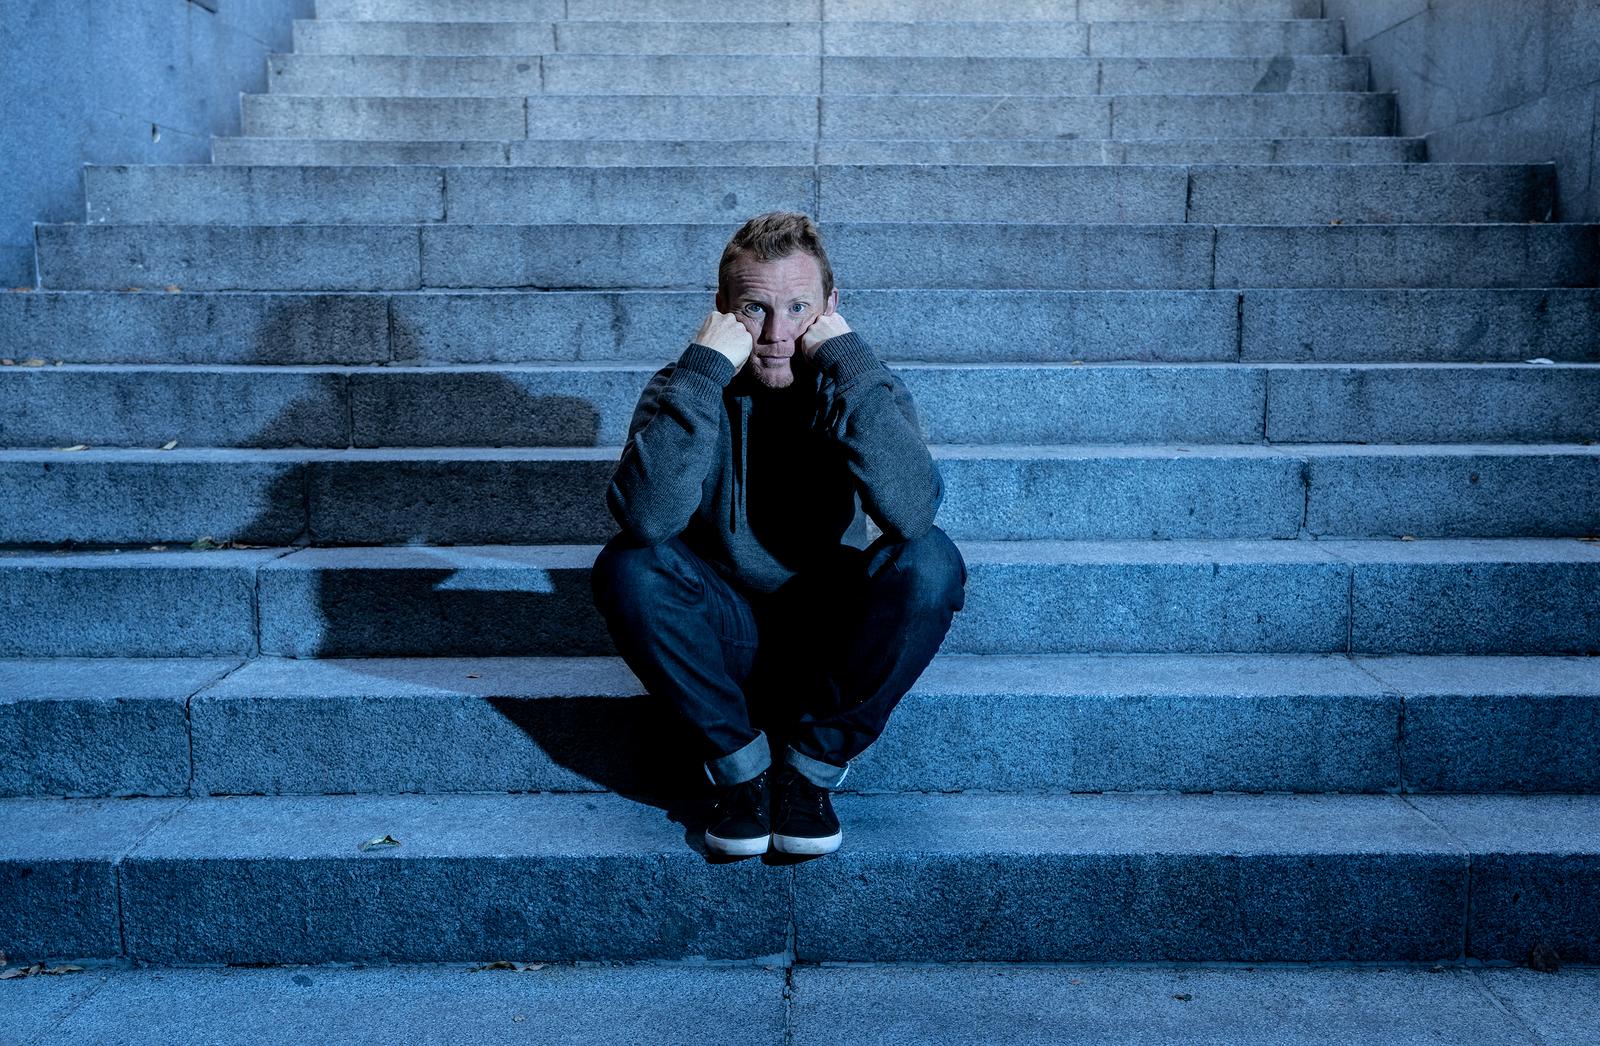 Depressed Sad Young Man Crying Sitting On Stairs Feeling Miserab